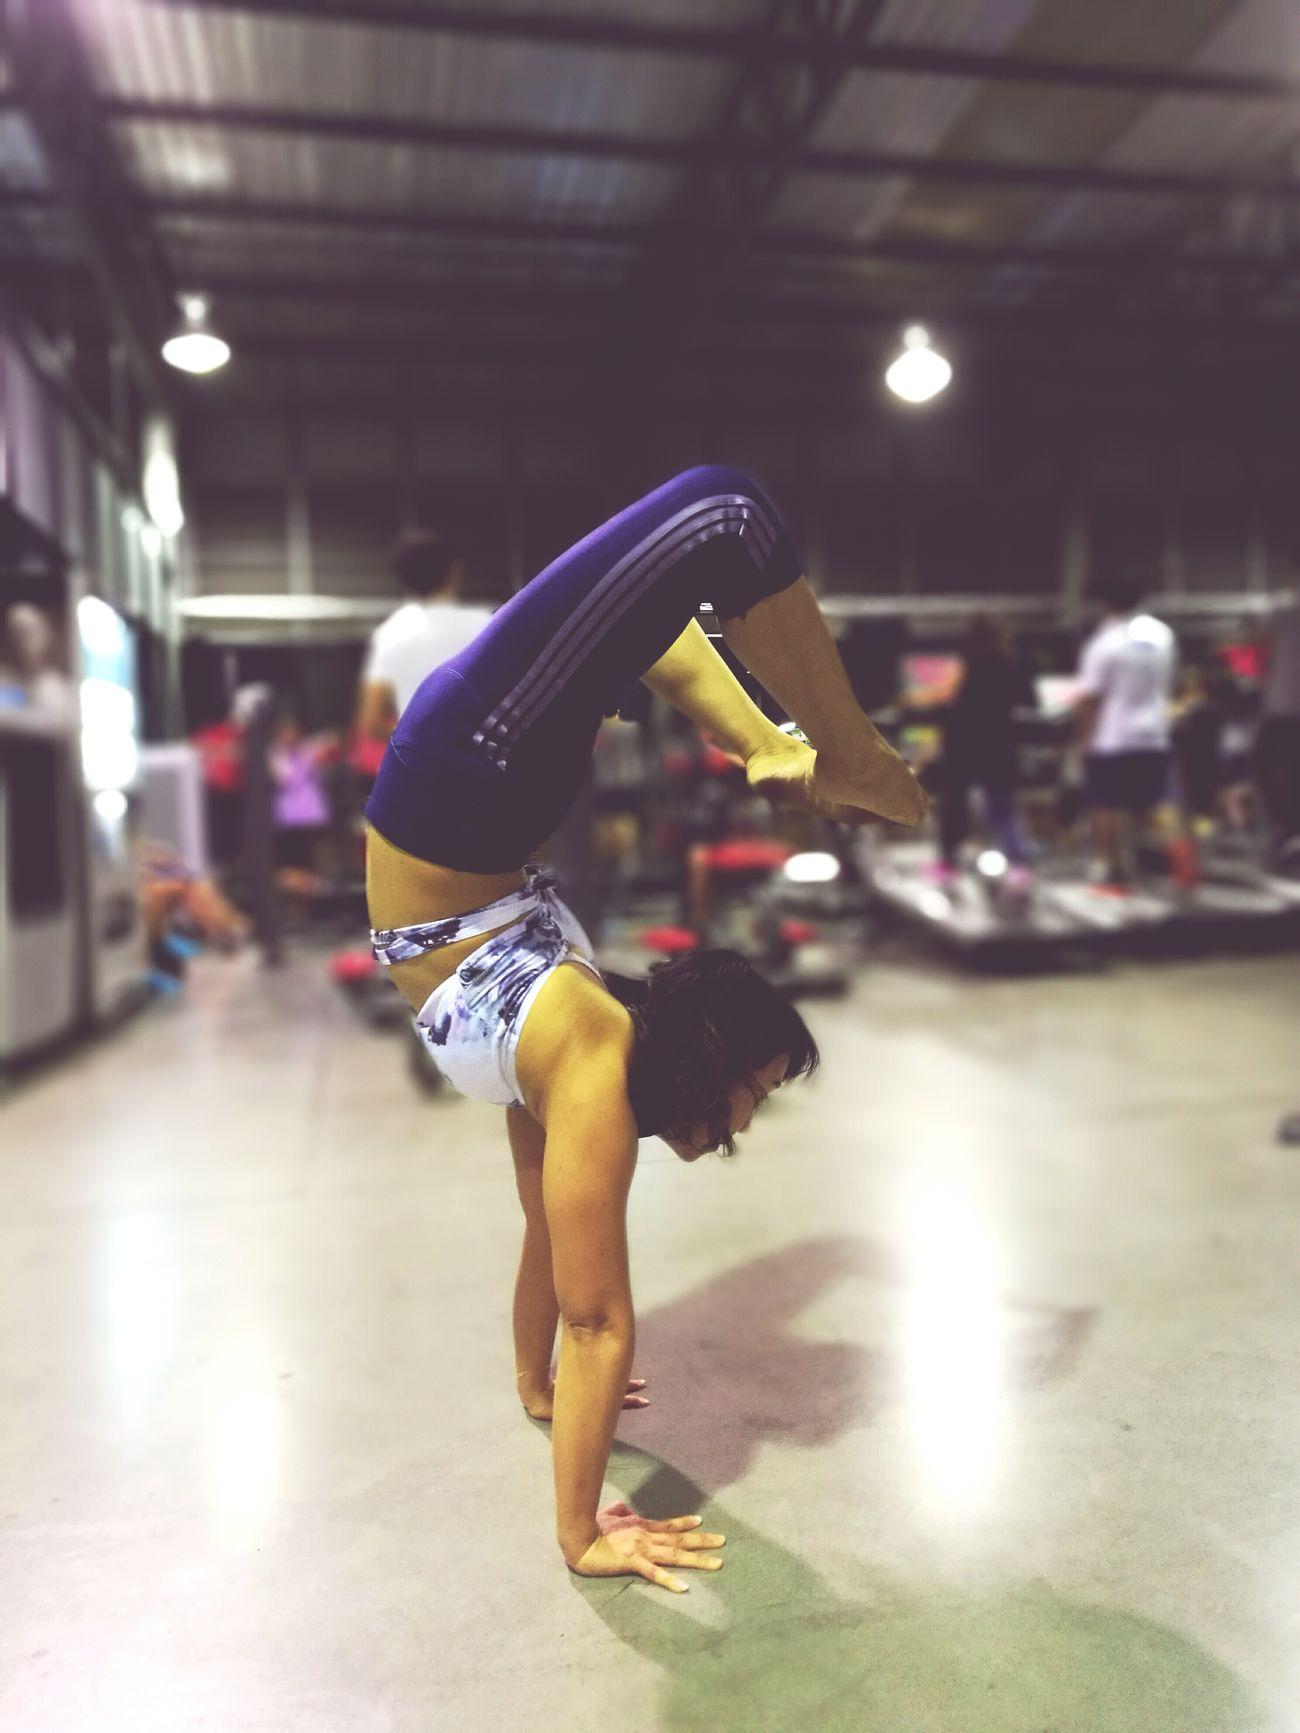 When everything seems so wrong, go yoga. Yoga Yogalife Yoga Lover Yogagirl Yogateacher Yogaeverywhere Yoga Pants Yogainspiration Messyhairdontcare Handstand  Upside Down Inversion Scorpion Handstandseverywhere